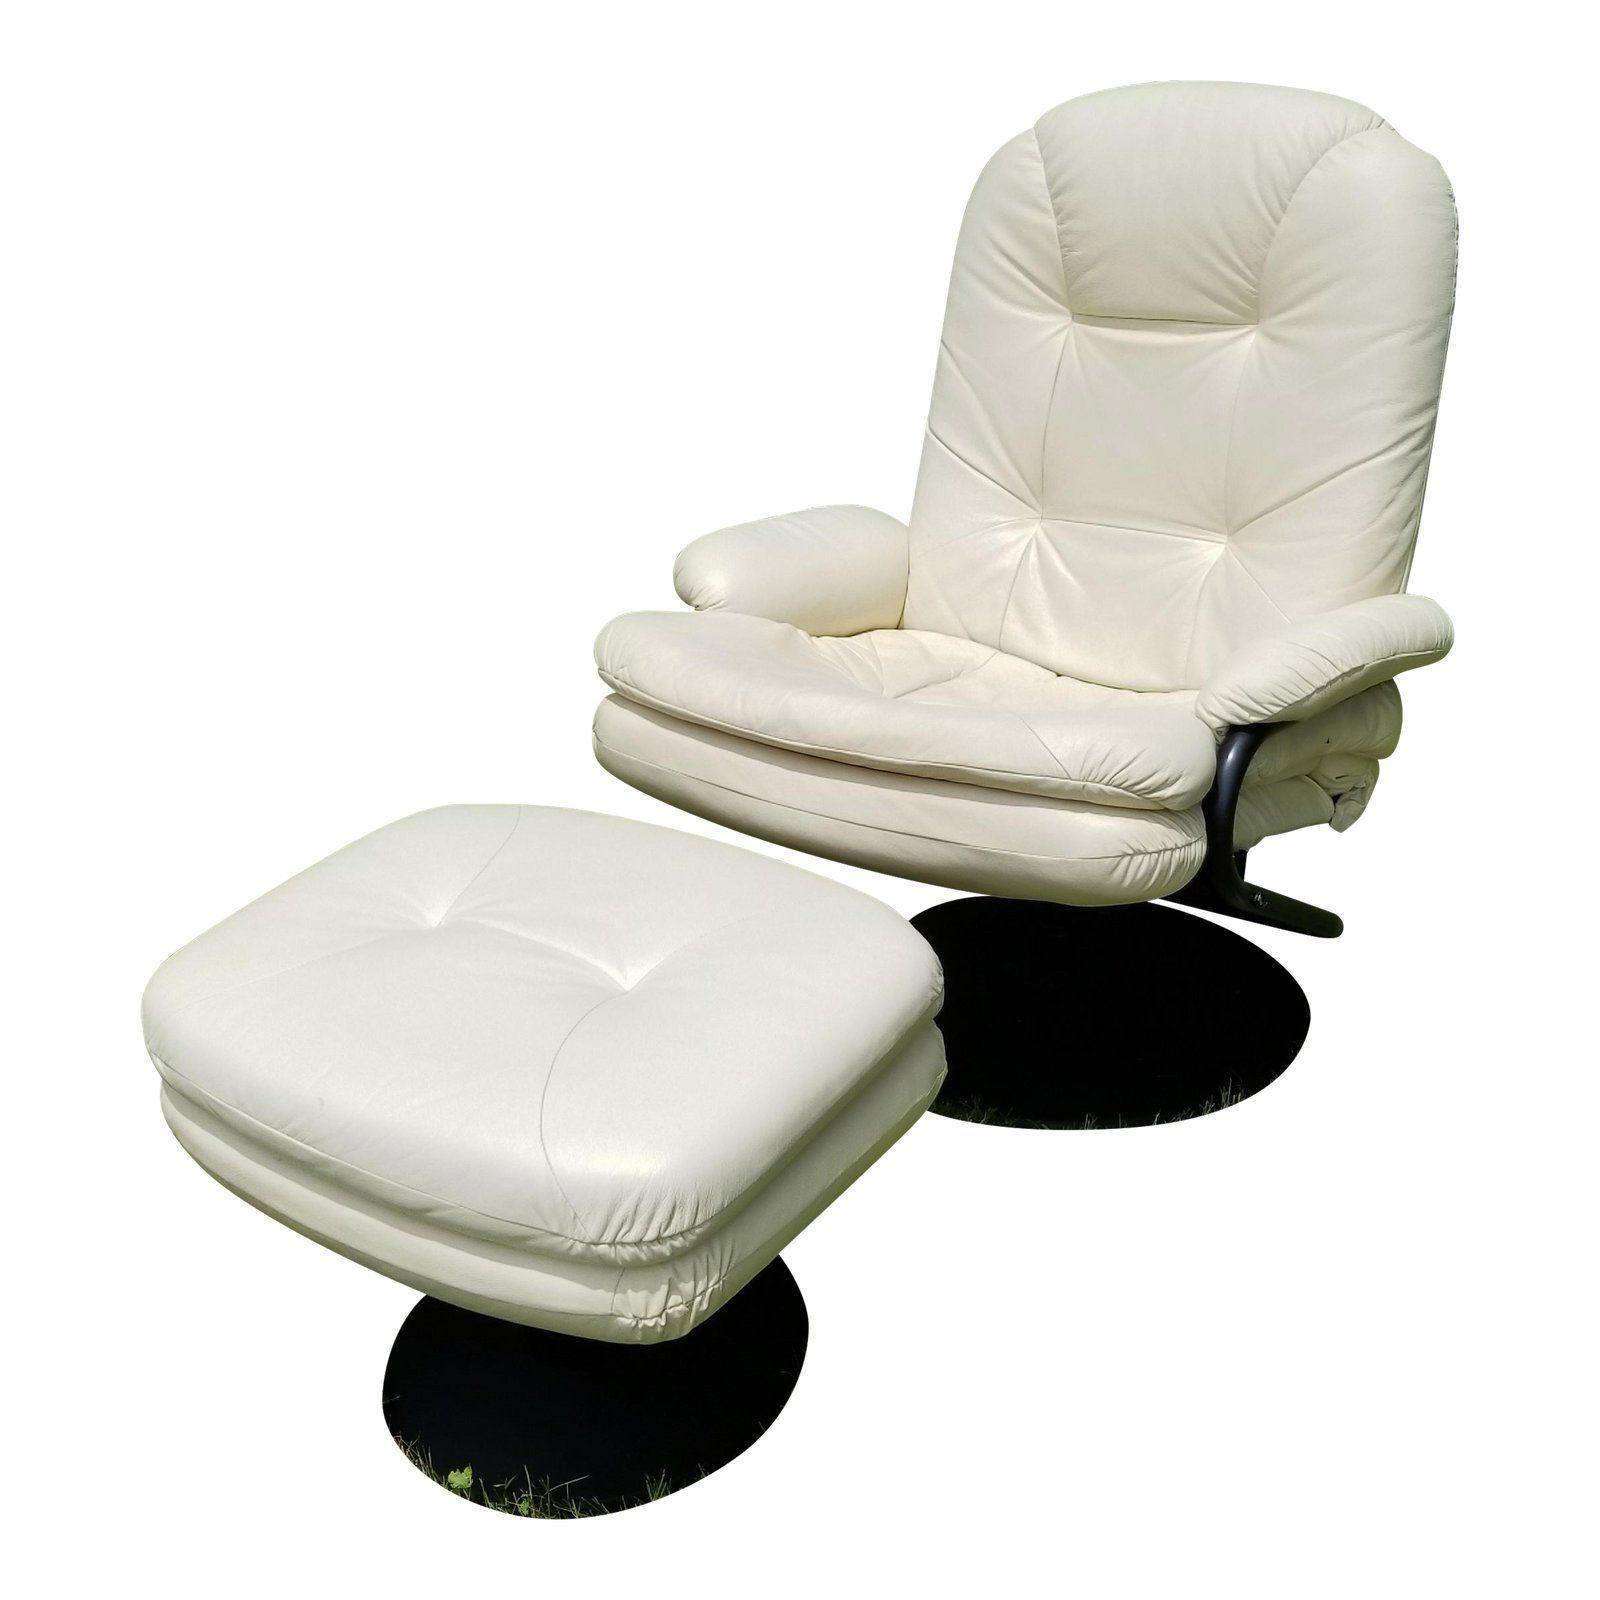 Contemporary Palliser White Leather Swivel Recliner